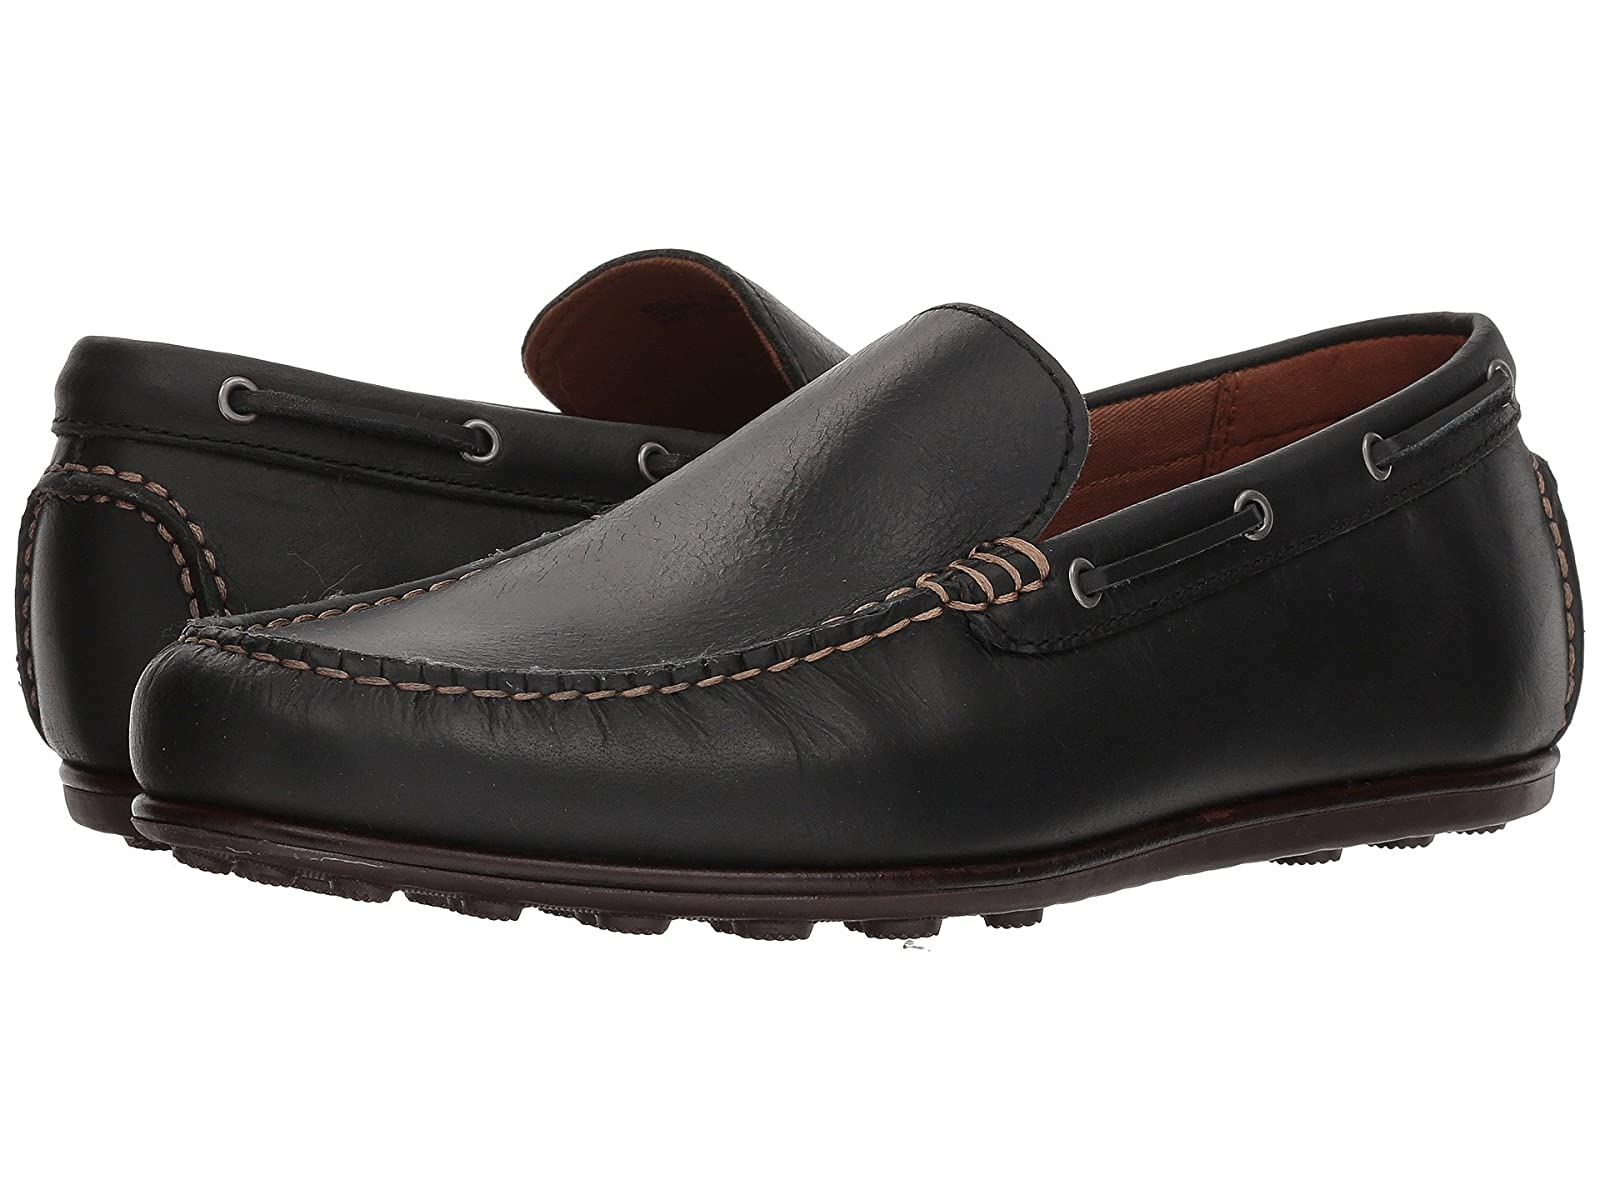 Frye Venetian Driving MocCheap and distinctive eye-catching shoes